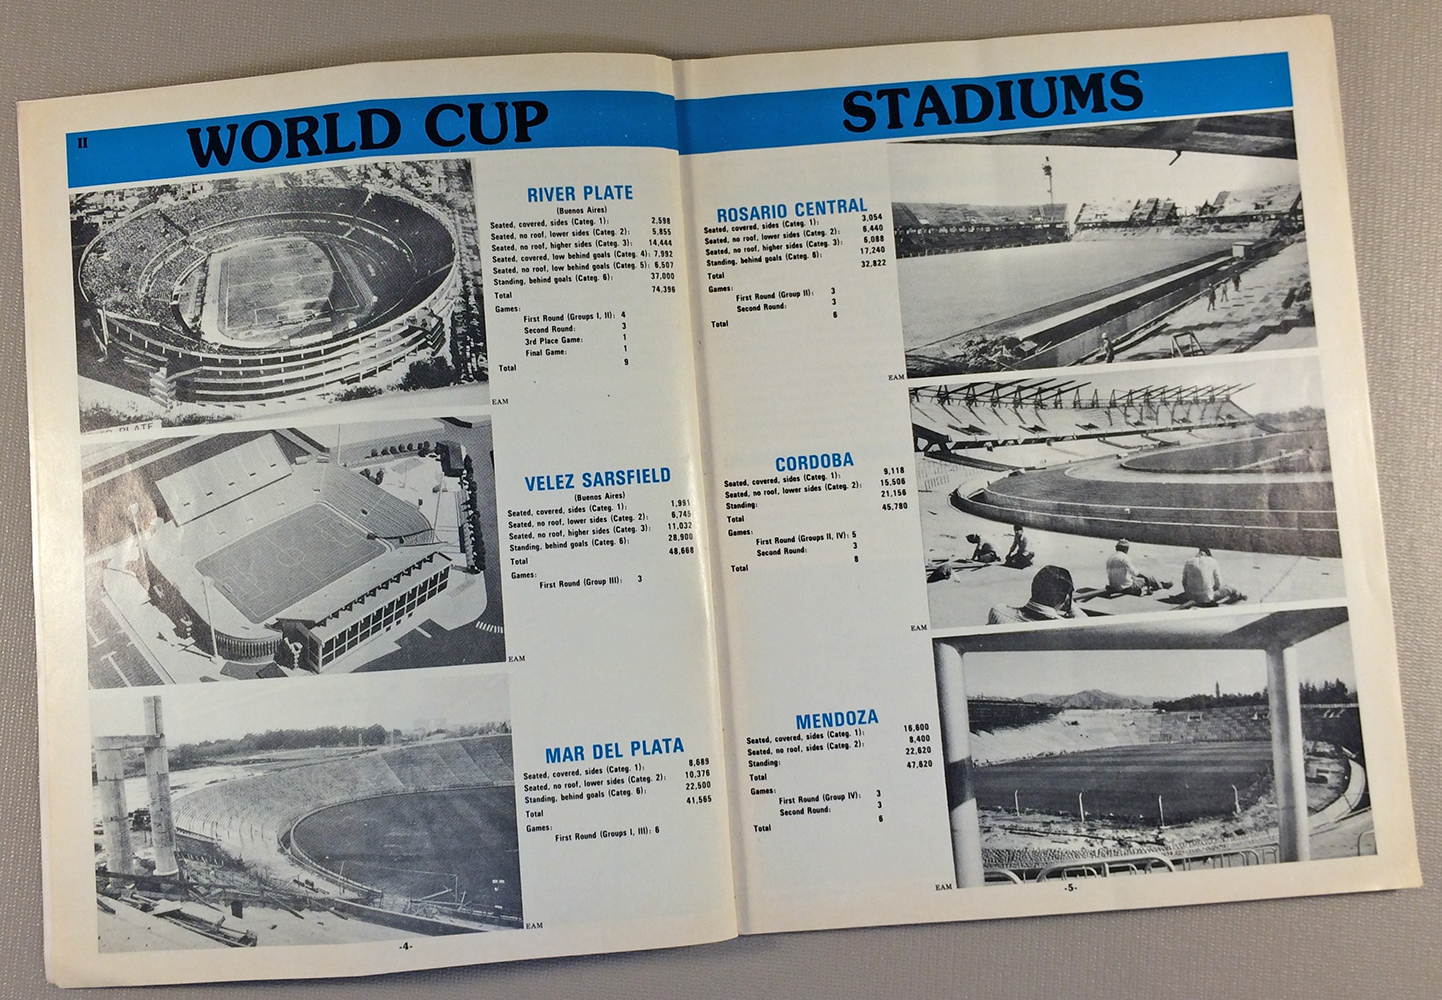 1978 World Cup Stadiums Argentina, River Plate, Mar Del Plata, Velez Sarsfield